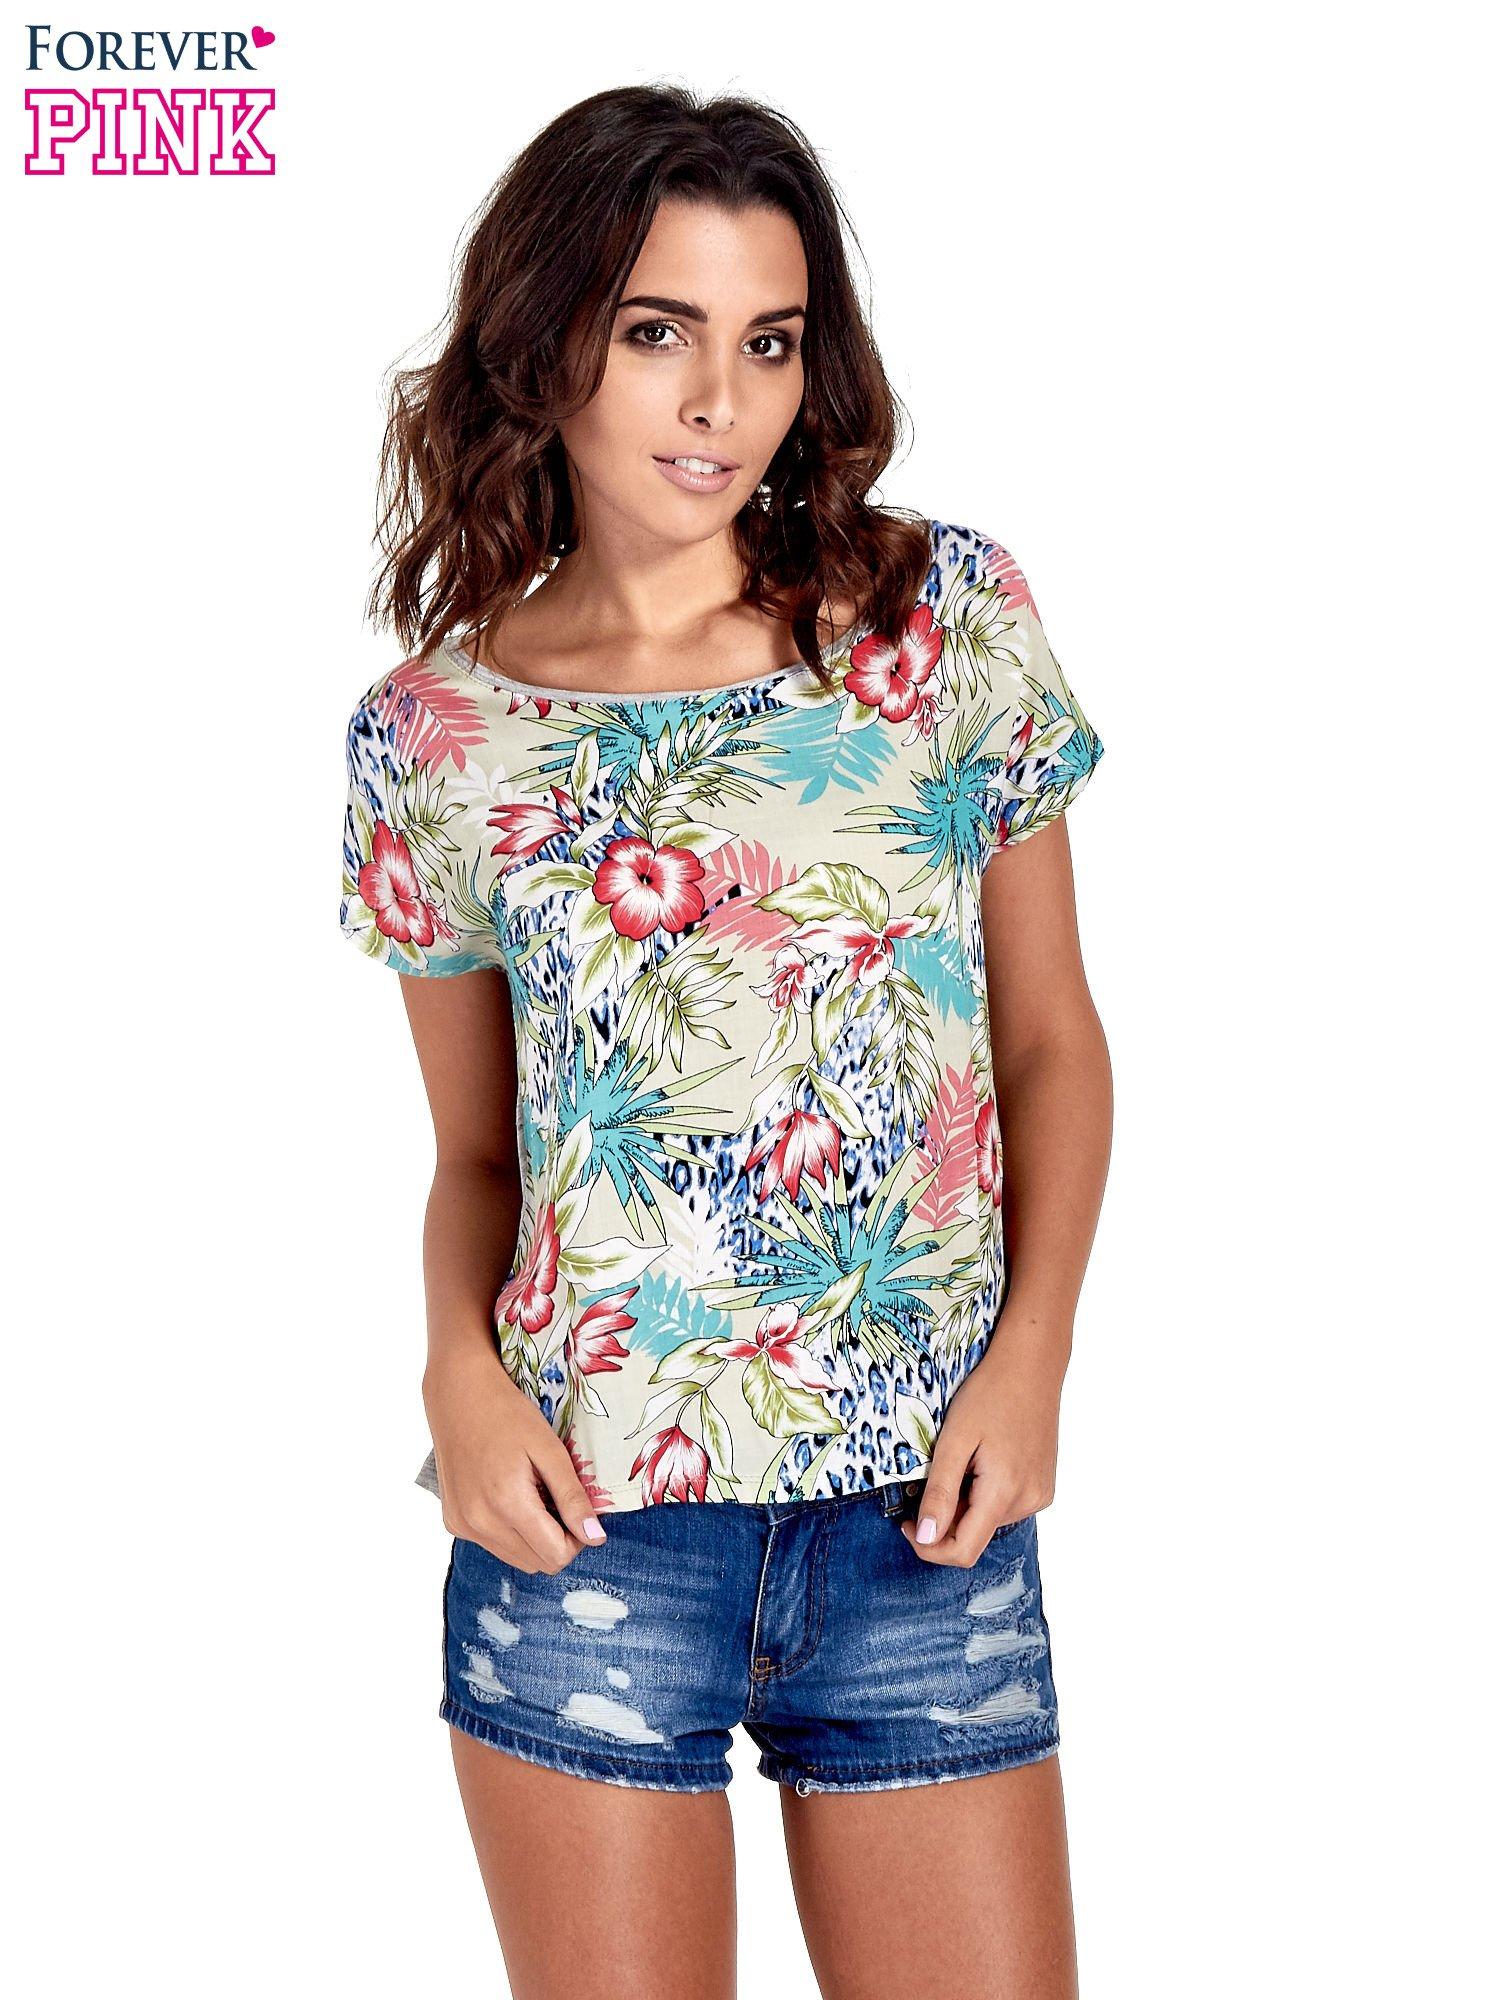 Szary t-shirt z nadrukiem floral print                                  zdj.                                  1